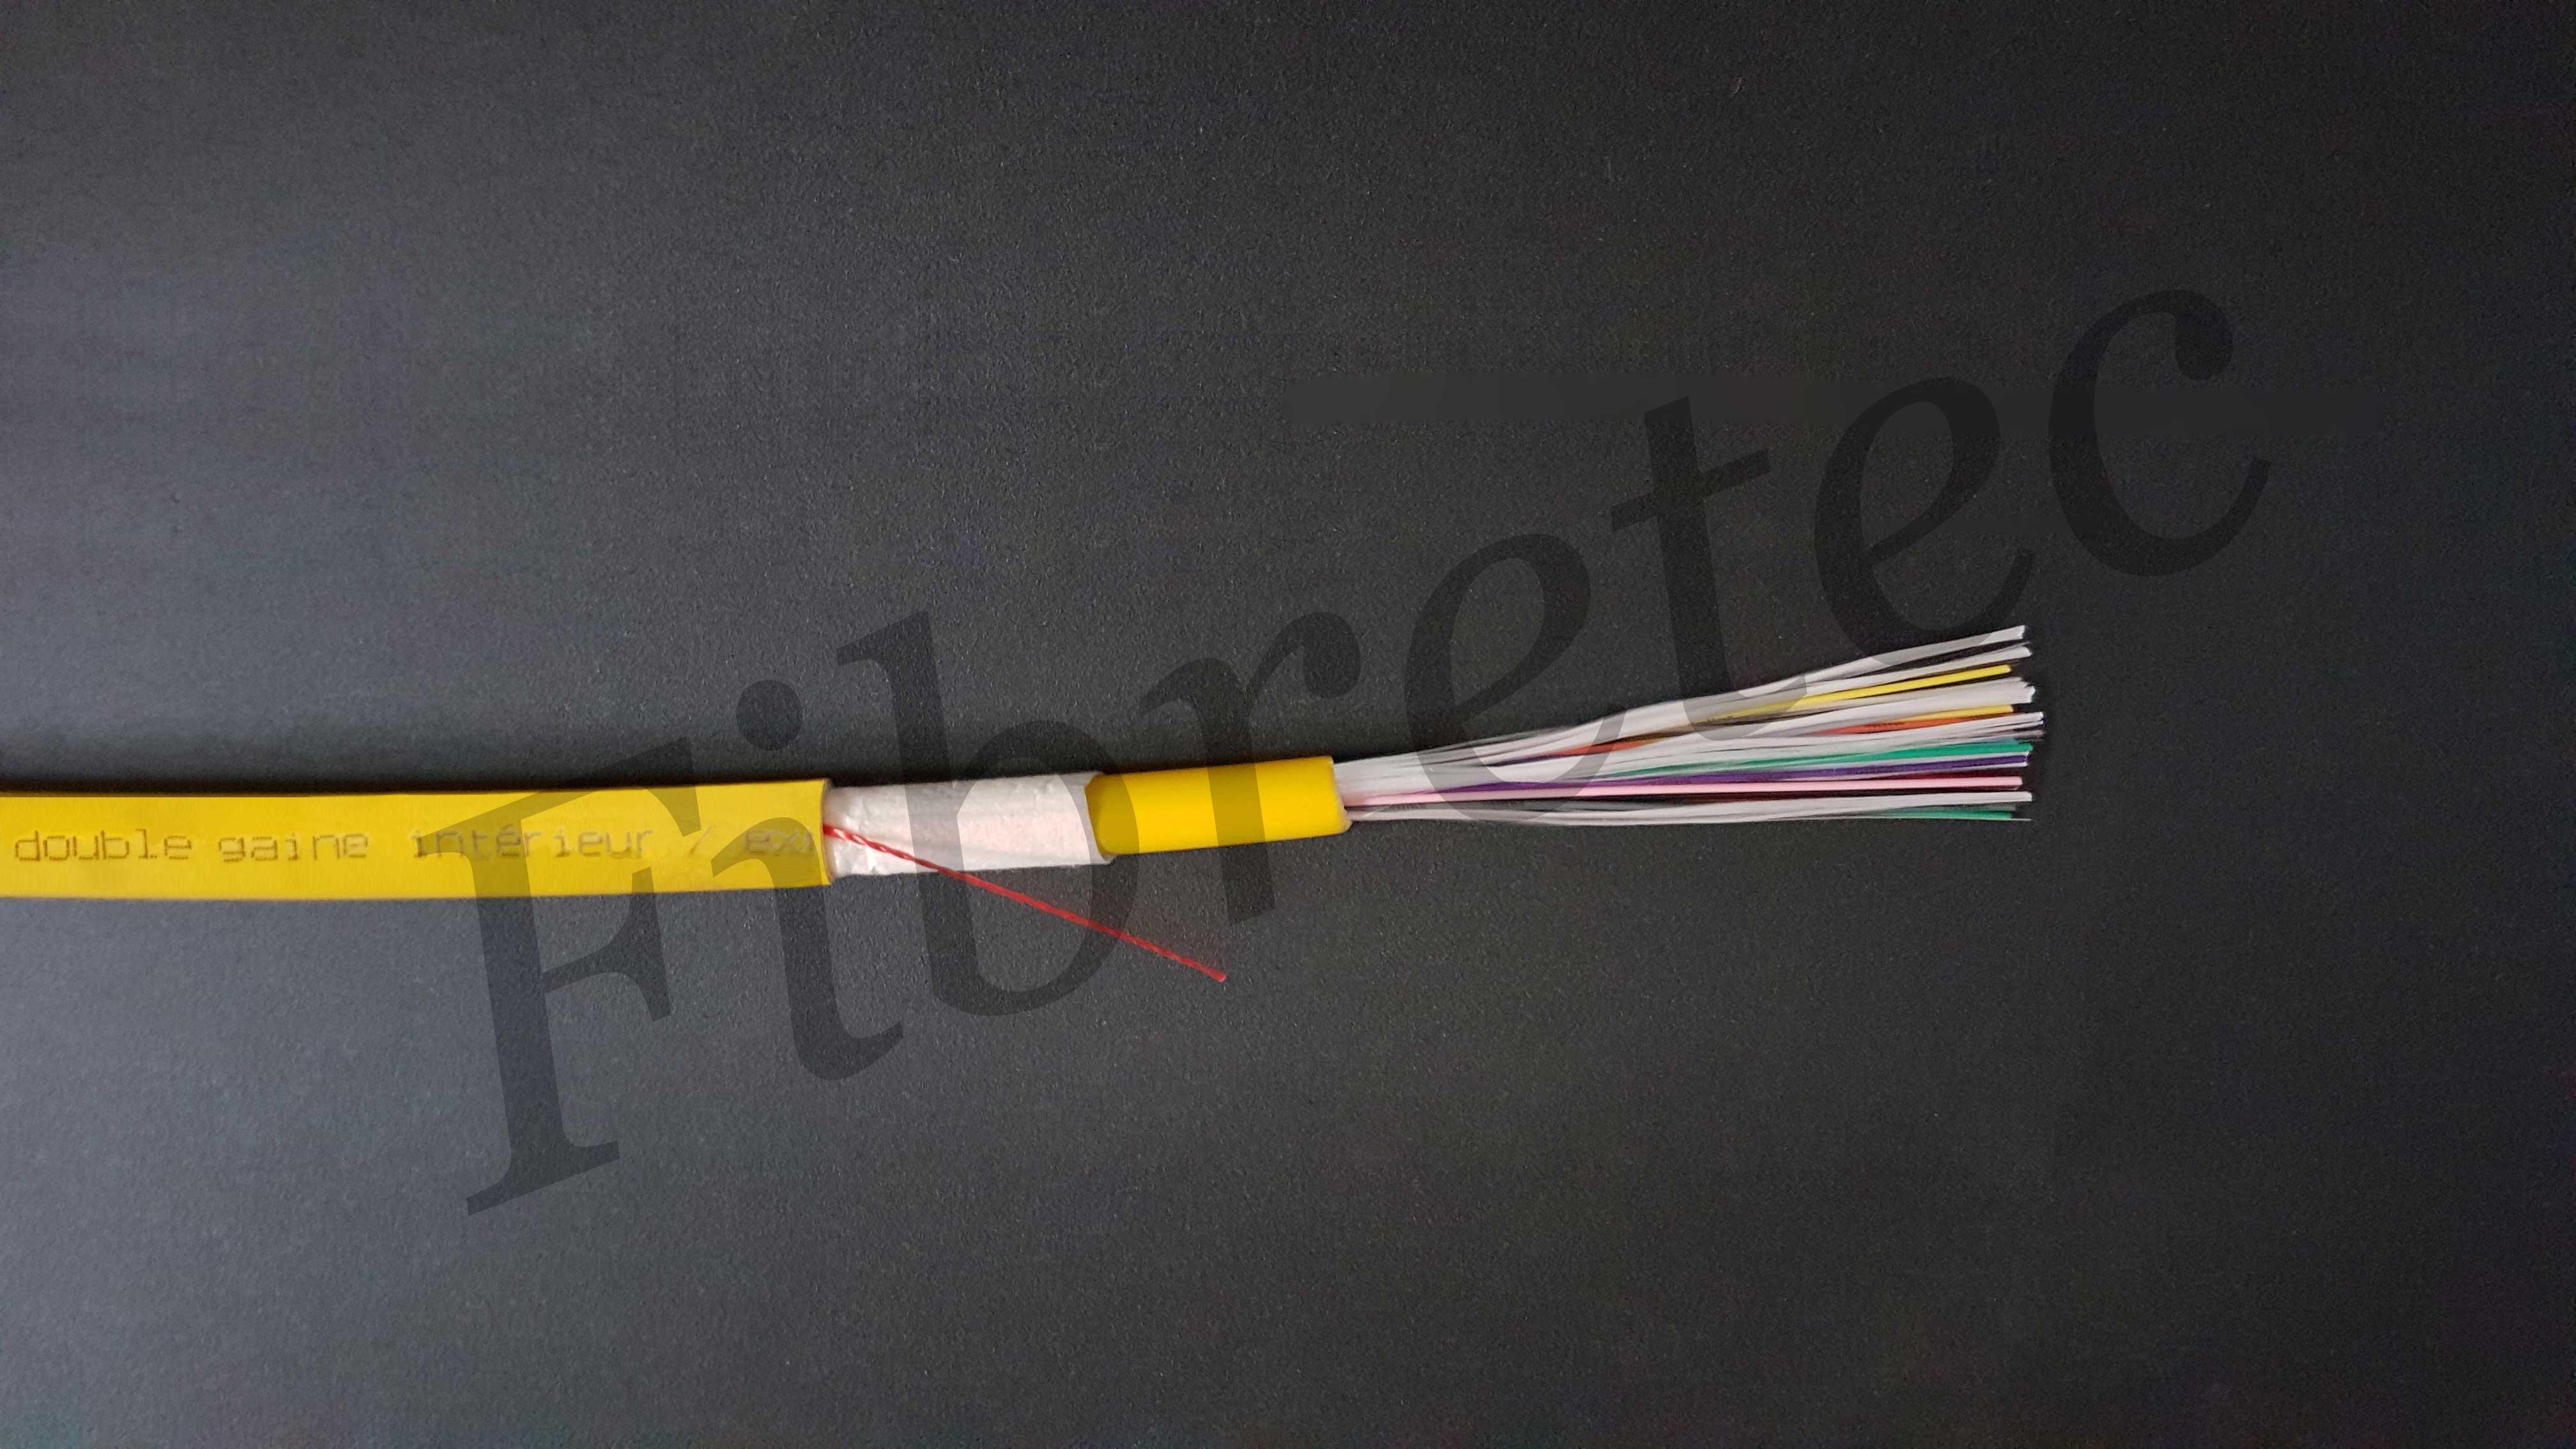 Câble Fiberstar int/ext 24 FO 9/125 G652D gaine LSZH, à structure serrée 900µm